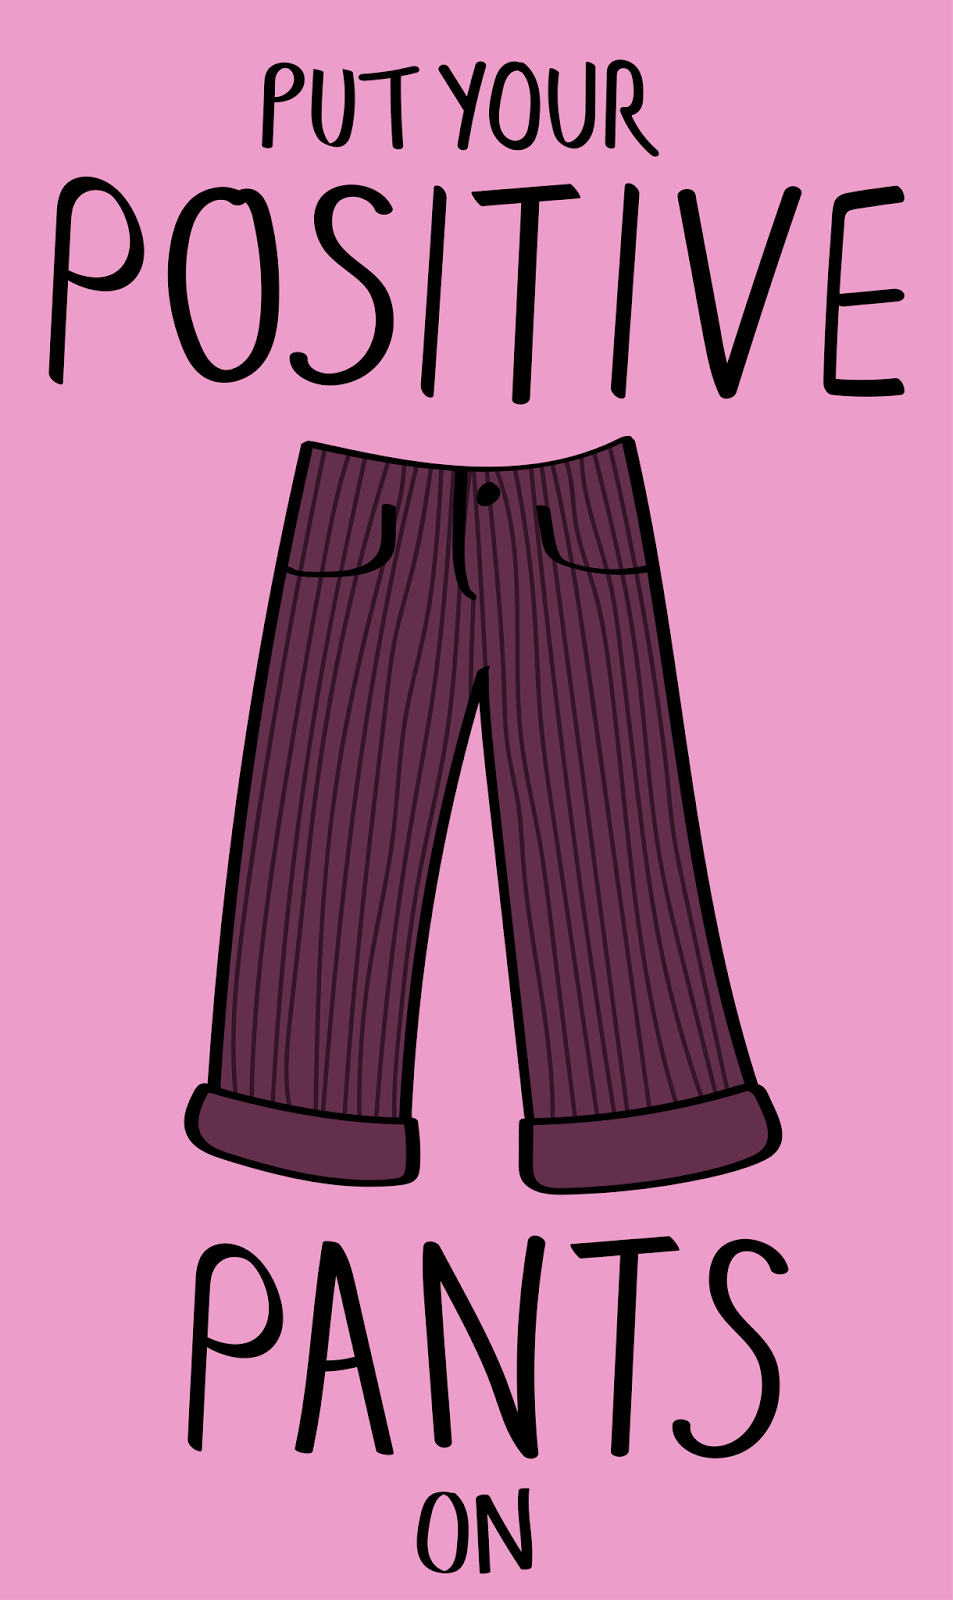 positive pants illustration